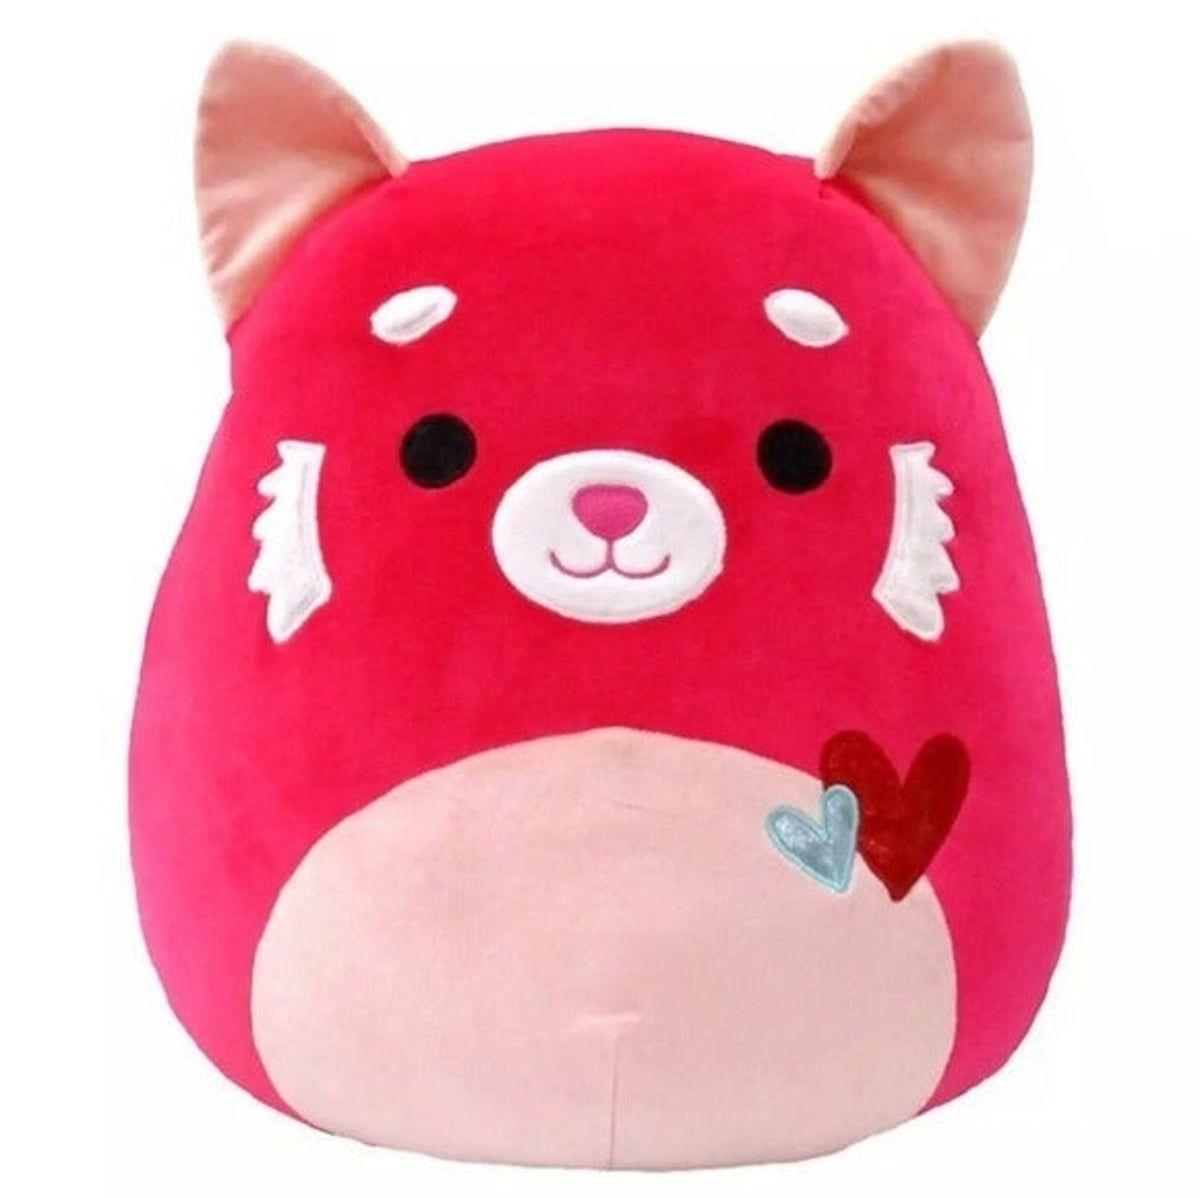 Nwt Squishmallows Red Panda 16 Plush On Mercari In 2021 Kids Toy Sale Red Panda Plush